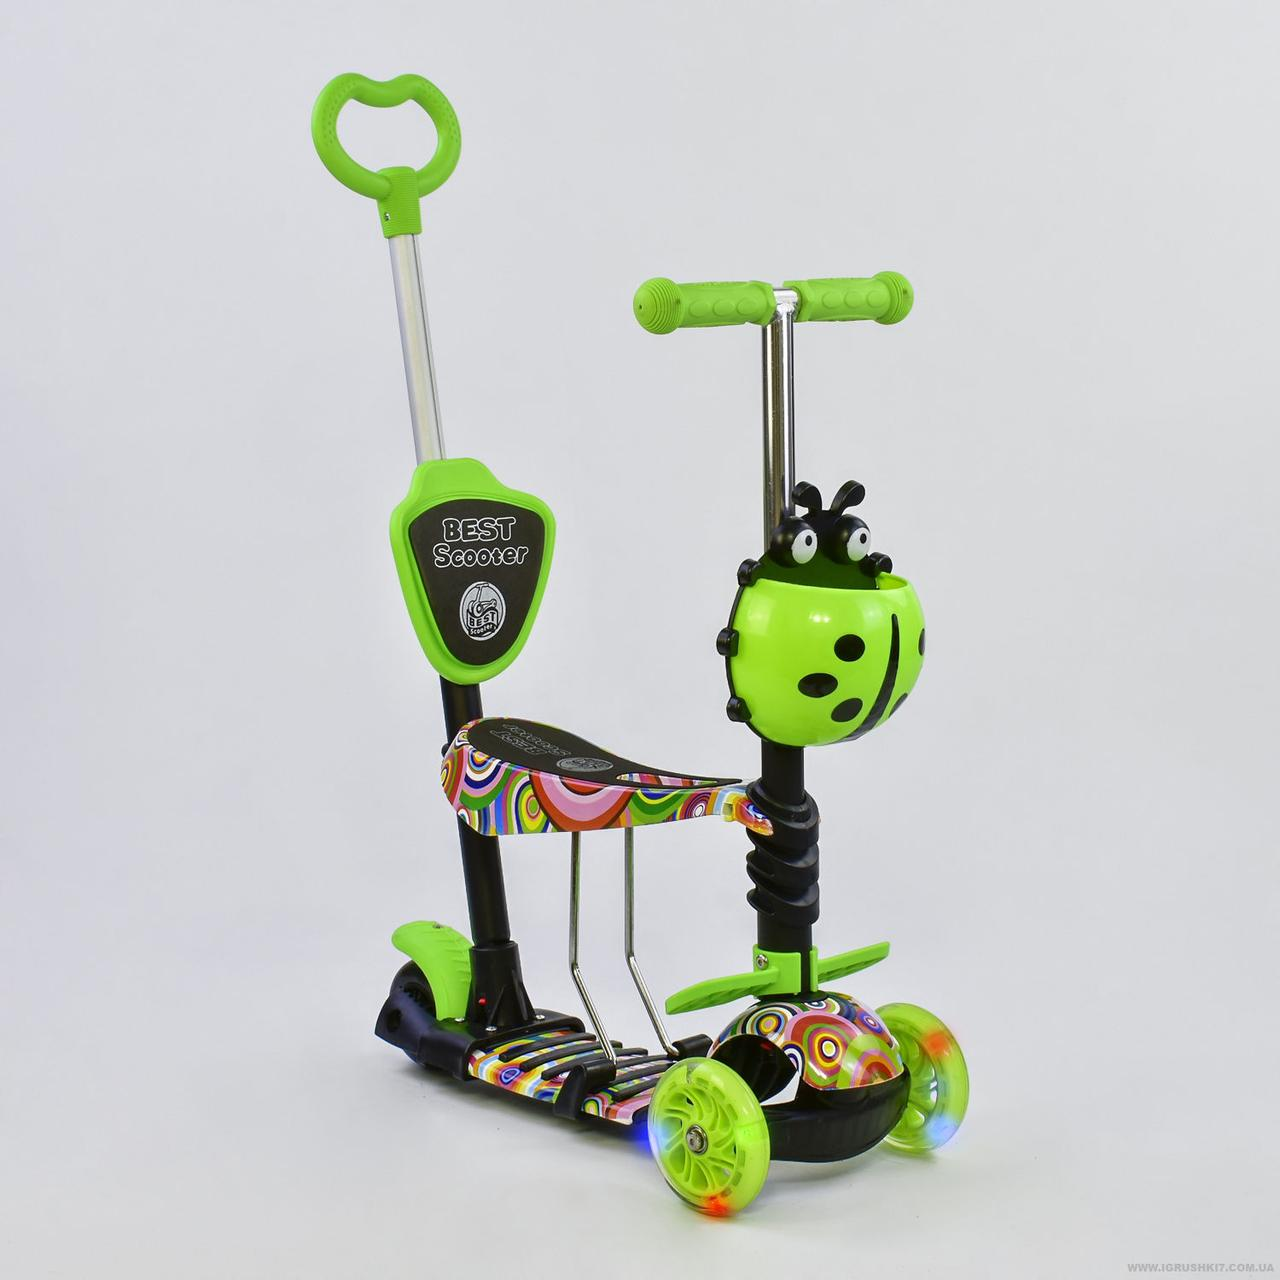 Самокат Best Trike 5в1 33650 Салатовый